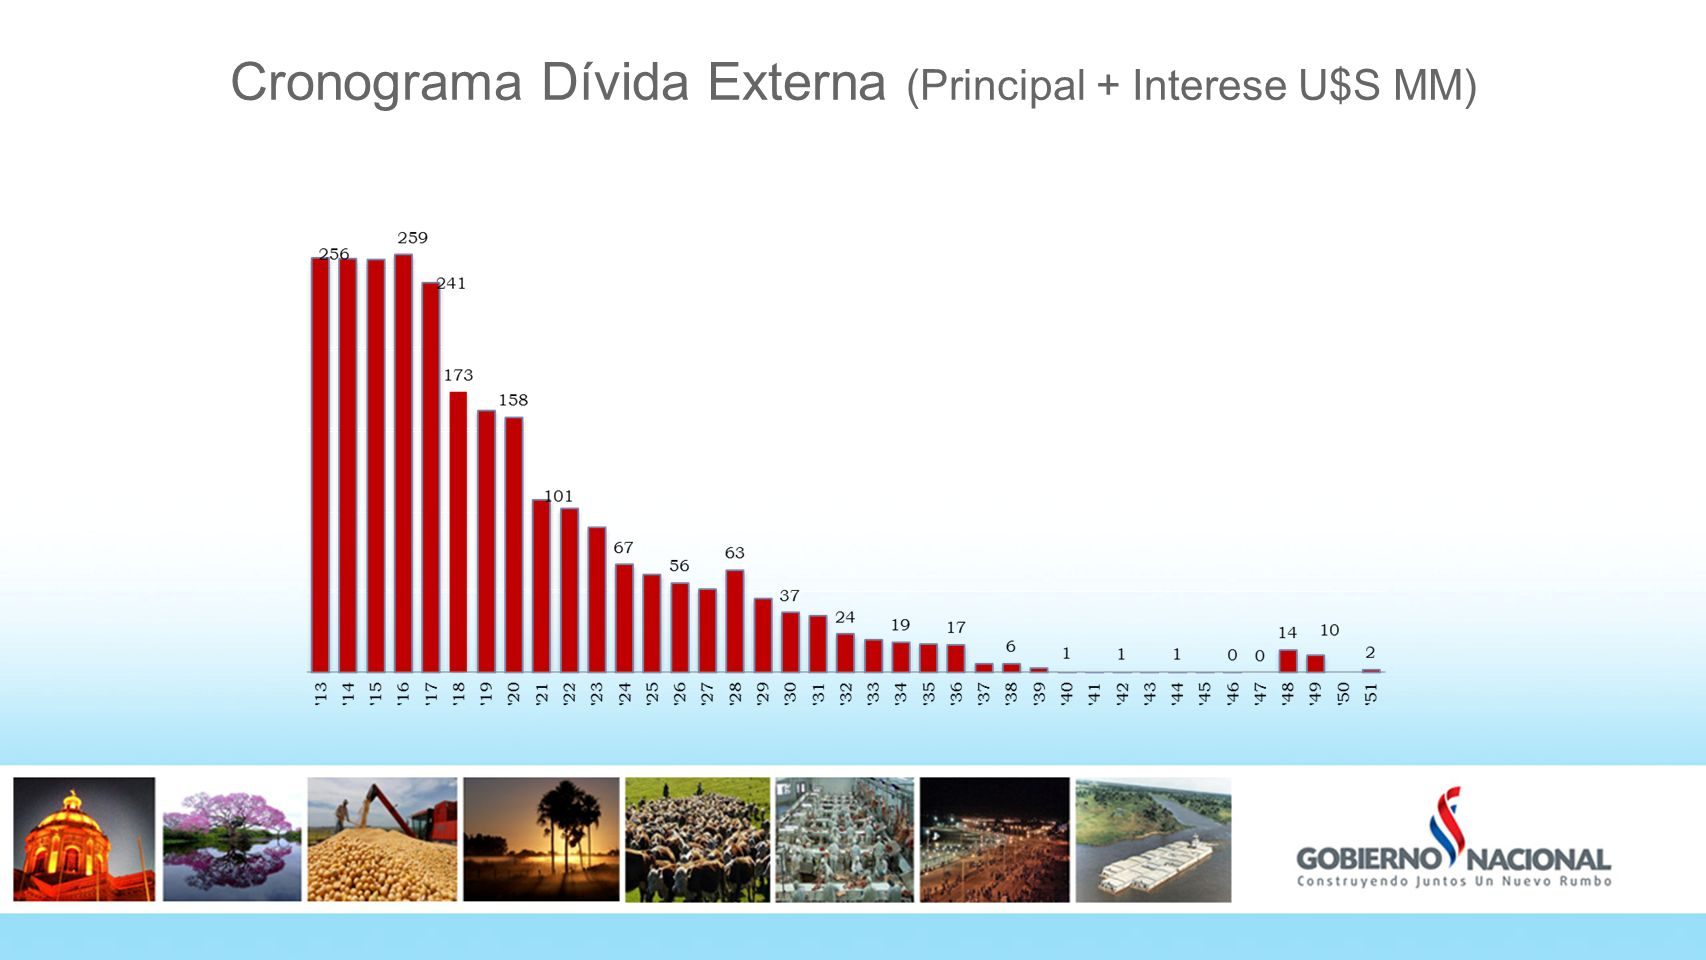 Cronograma Dívida Externa (Principal + Interese U$S MM)